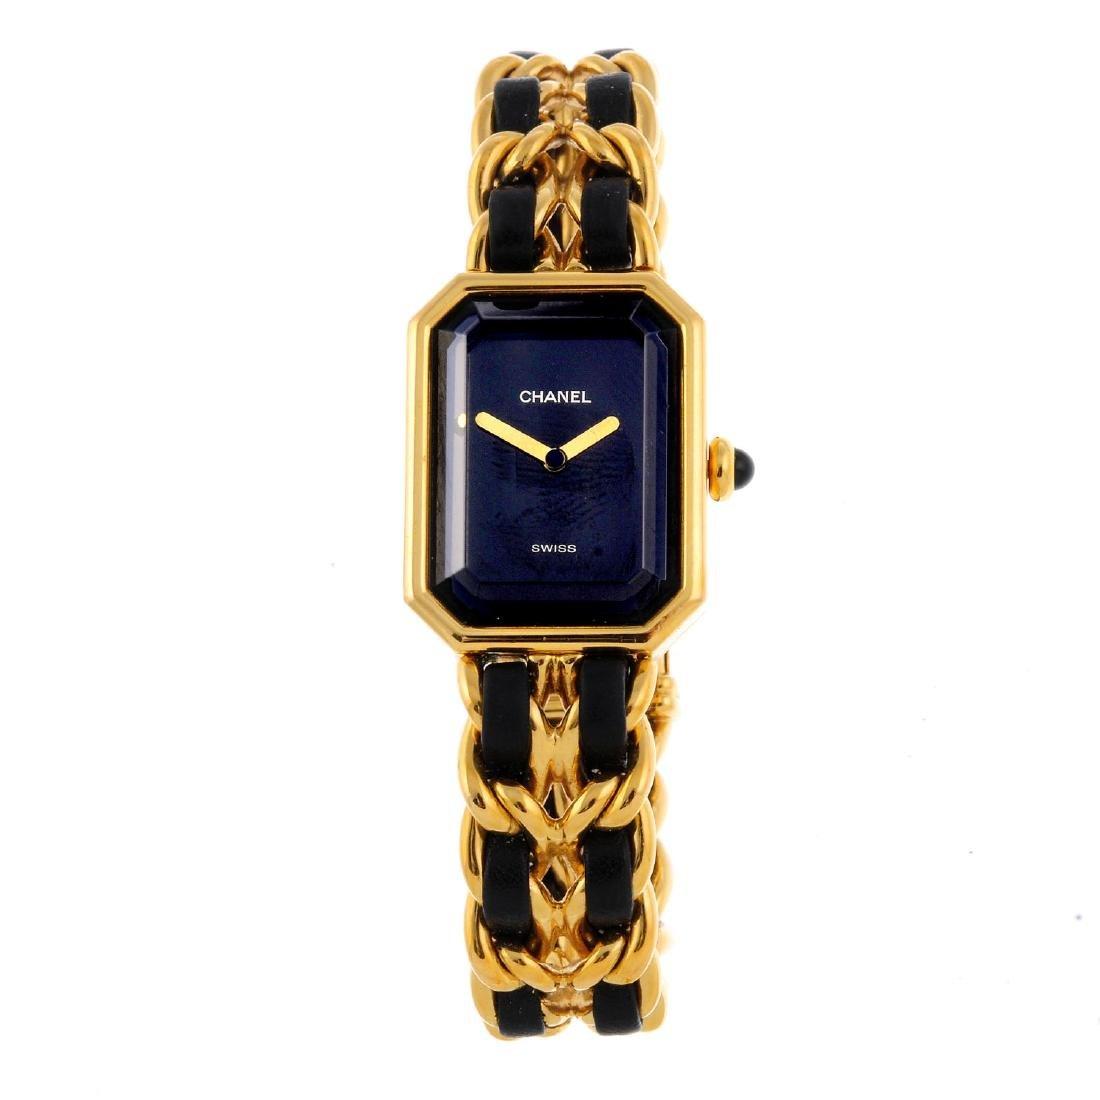 CHANEL - a lady's Premiere bracelet watch. Gold plated